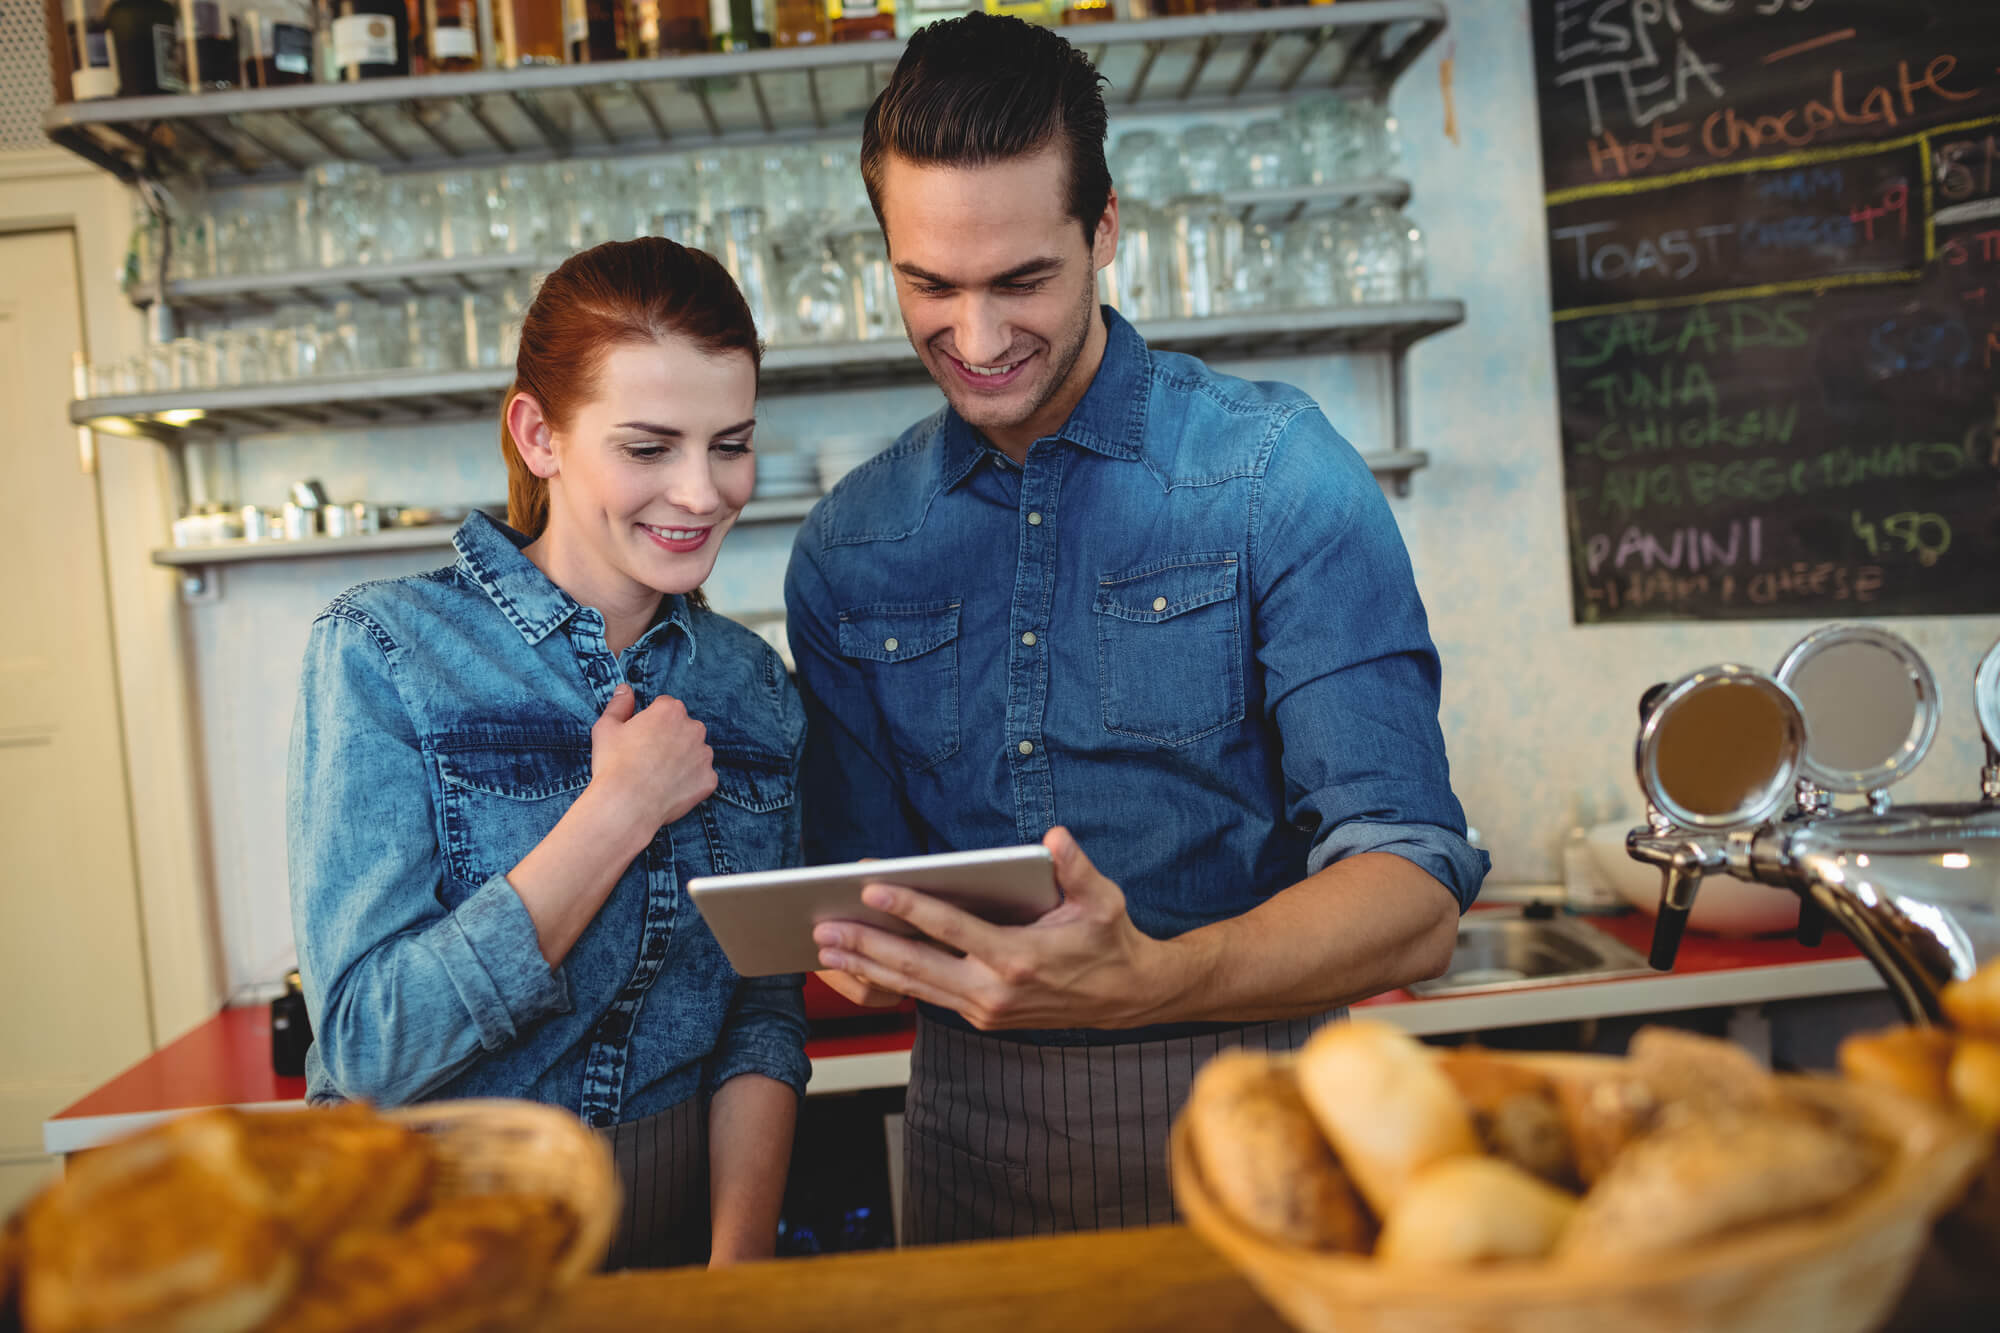 mercado de food service quais os riscos desafios e oportunidades